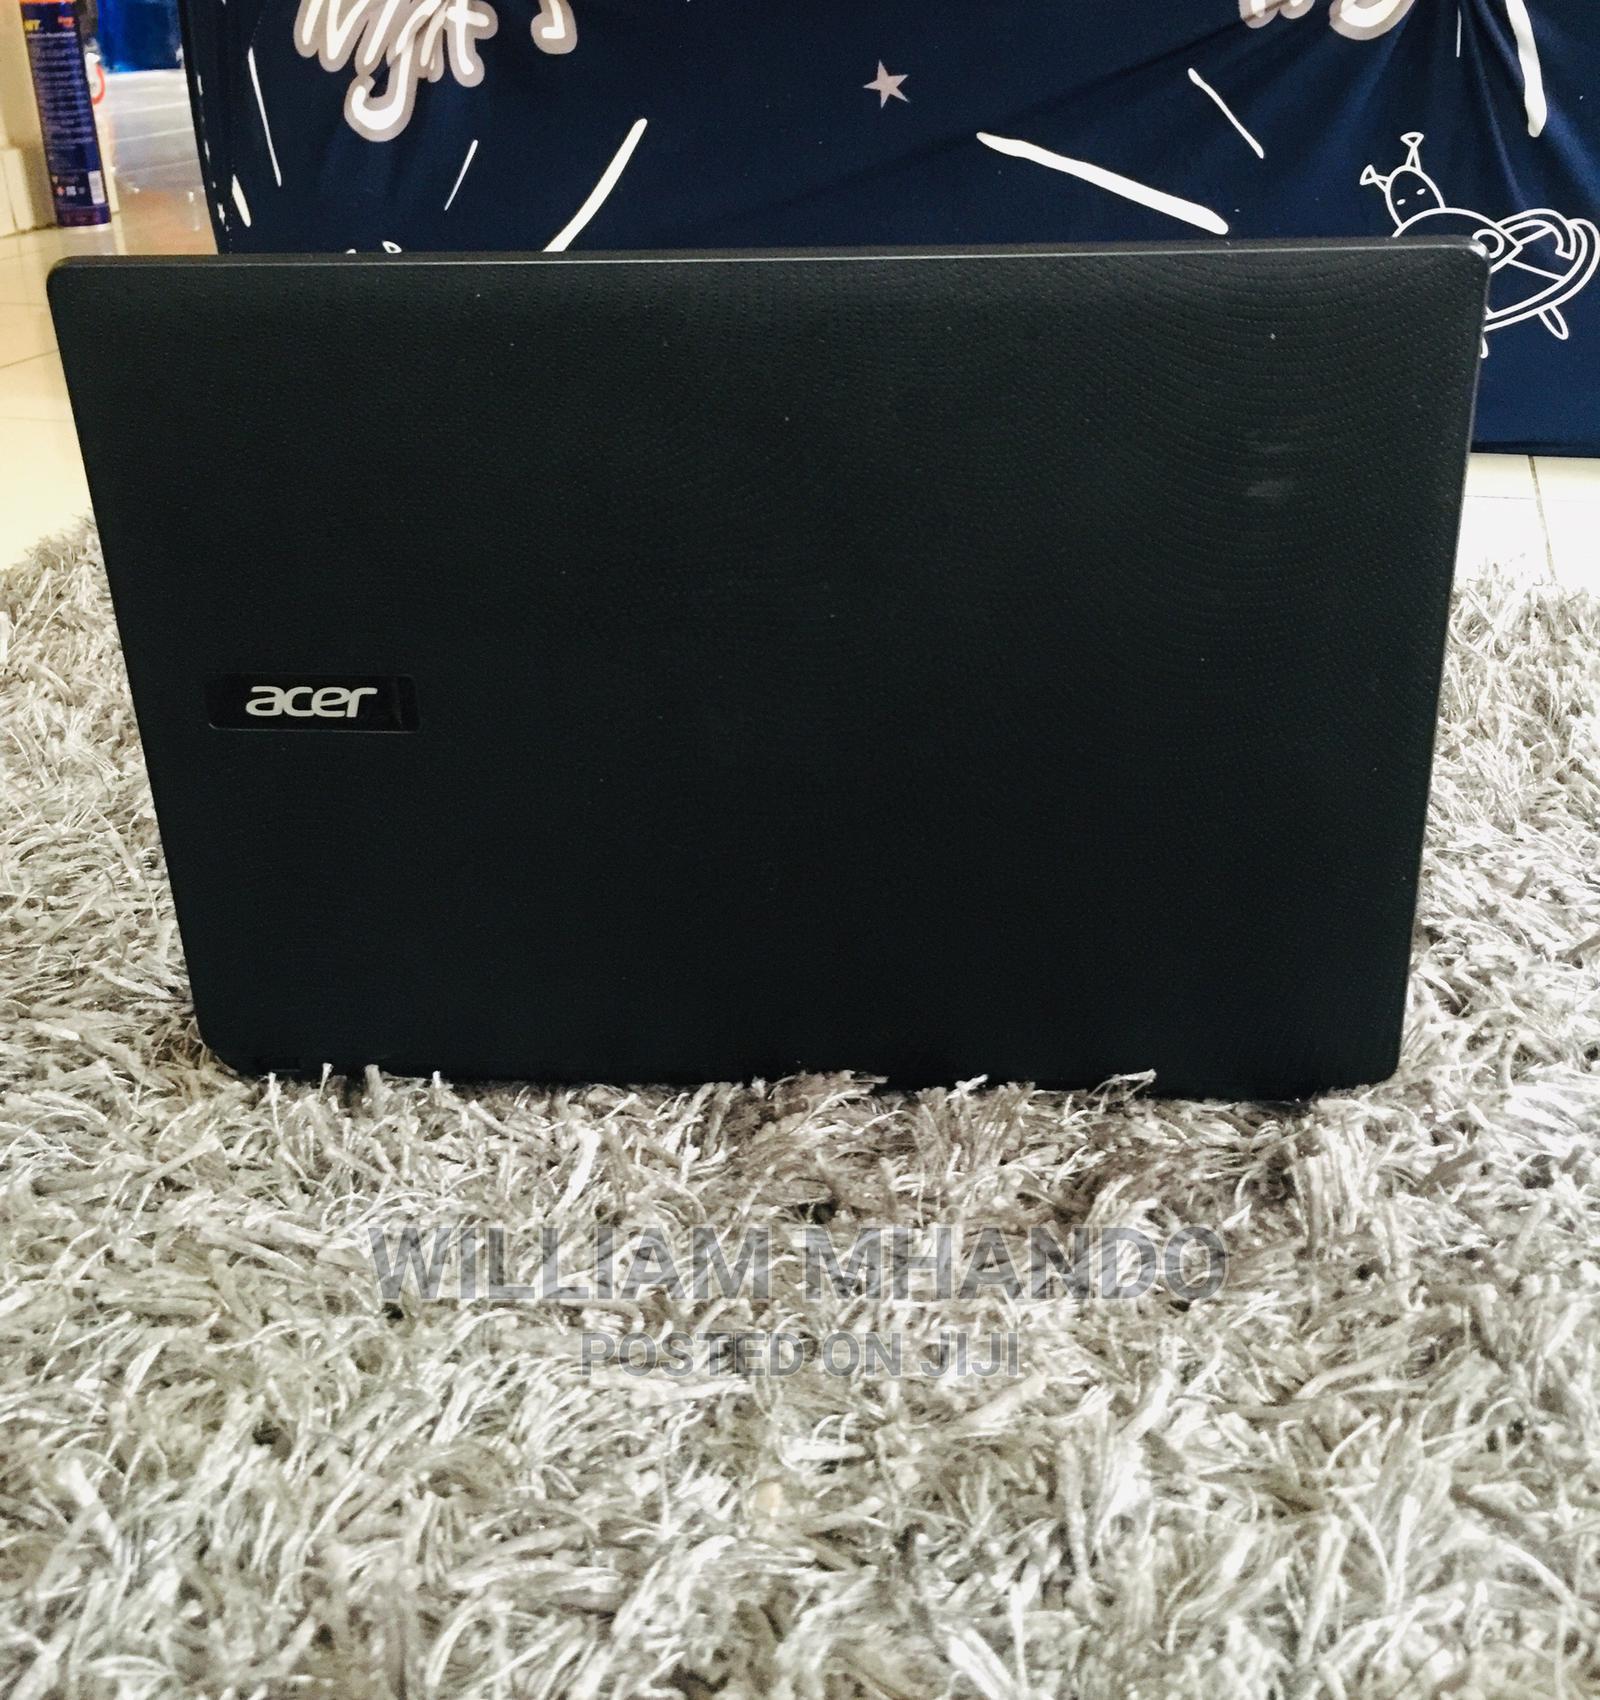 Laptop Acer Aspire 1430Z 8GB Intel Celeron HDD 500GB | Laptops & Computers for sale in Temeke, Dar es Salaam, Tanzania